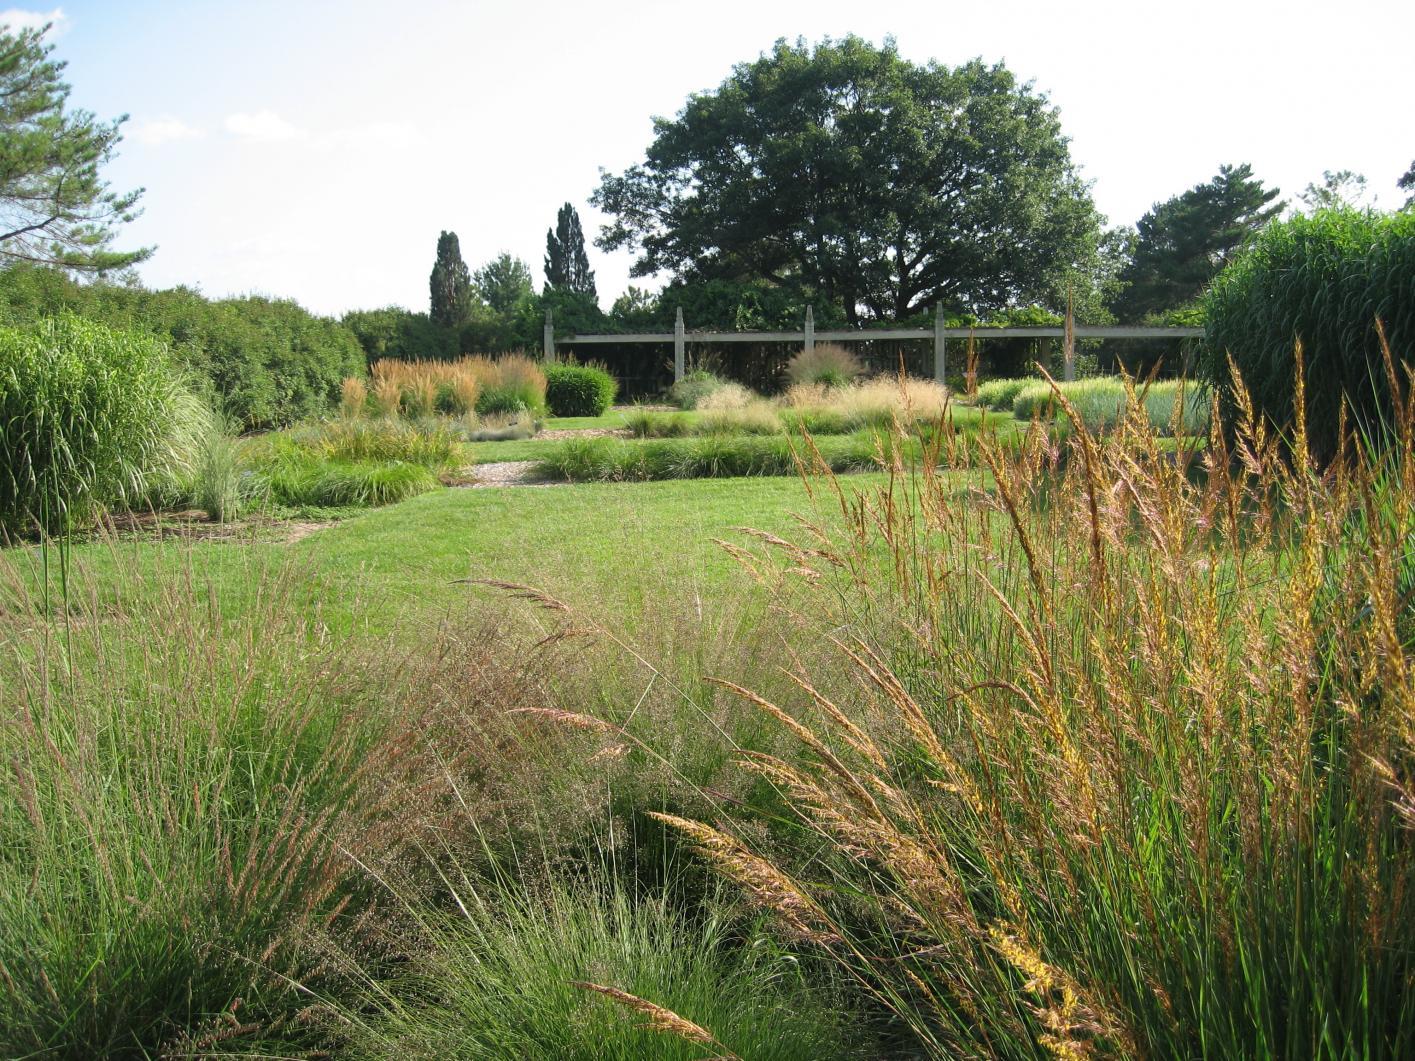 Ornamental Grasses American Public Gardens Association